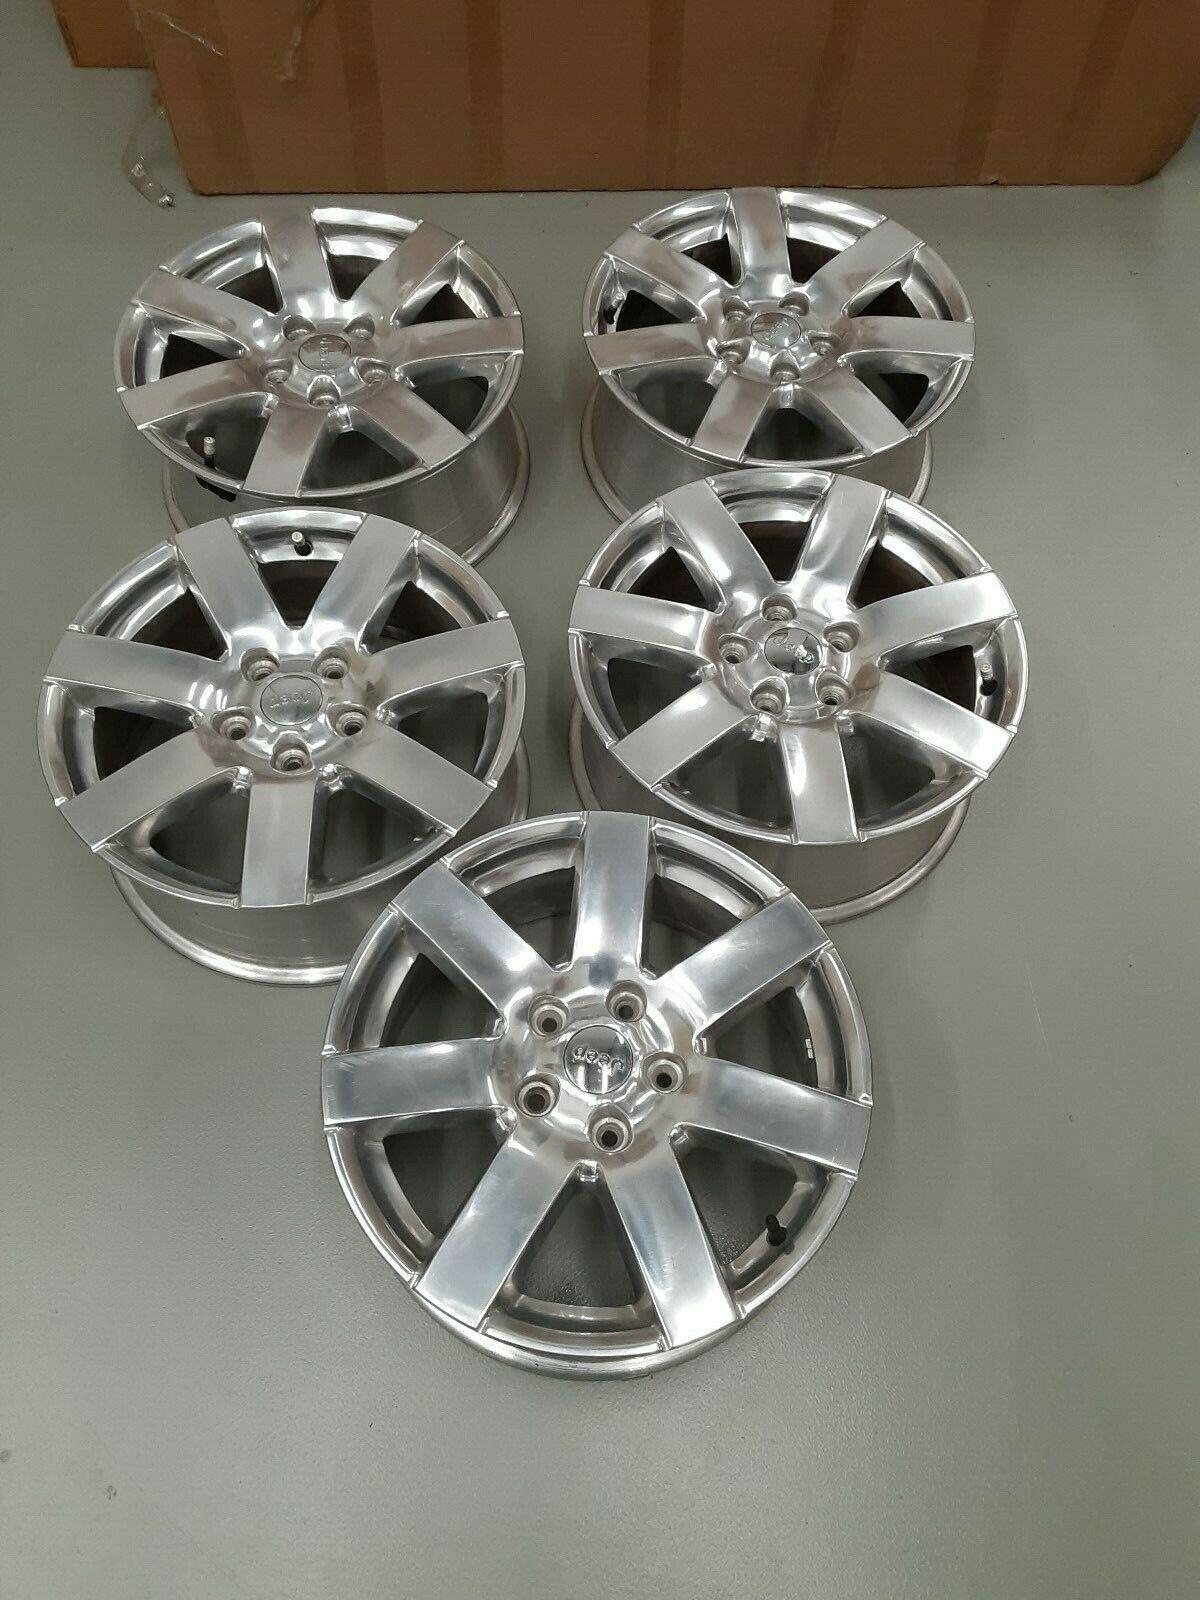 18 Inch Jeep Rims : Wrangler, Wheels, Wheels,, Wrangler,